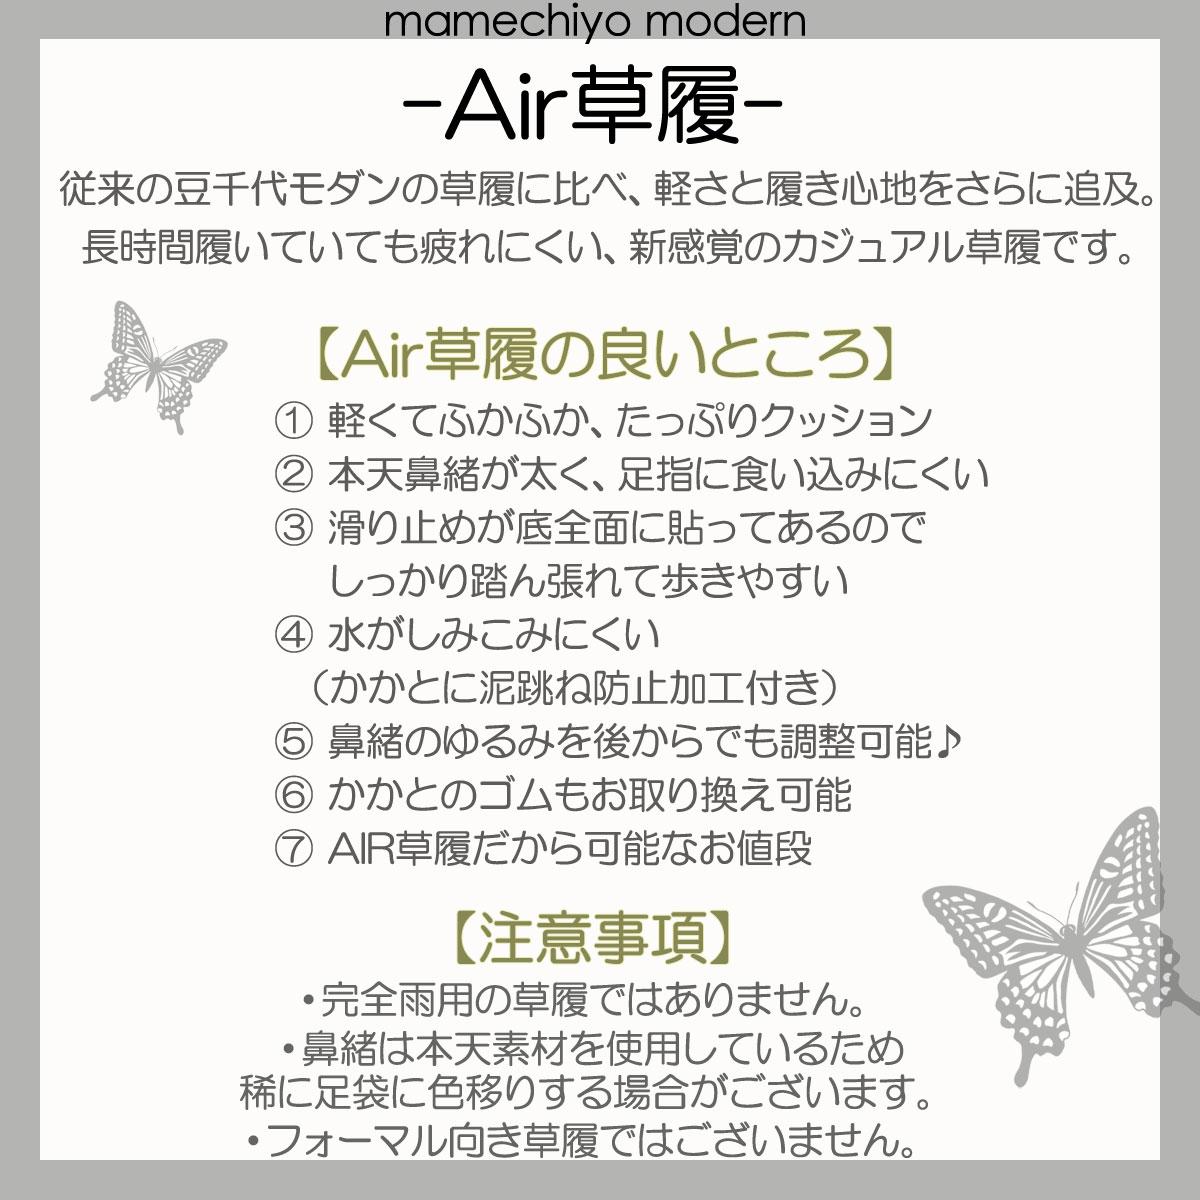 AIR草履 レディ*バタフライ 白蝶×生成りつぼ(S・M・Lサイズ) 【店頭在庫】